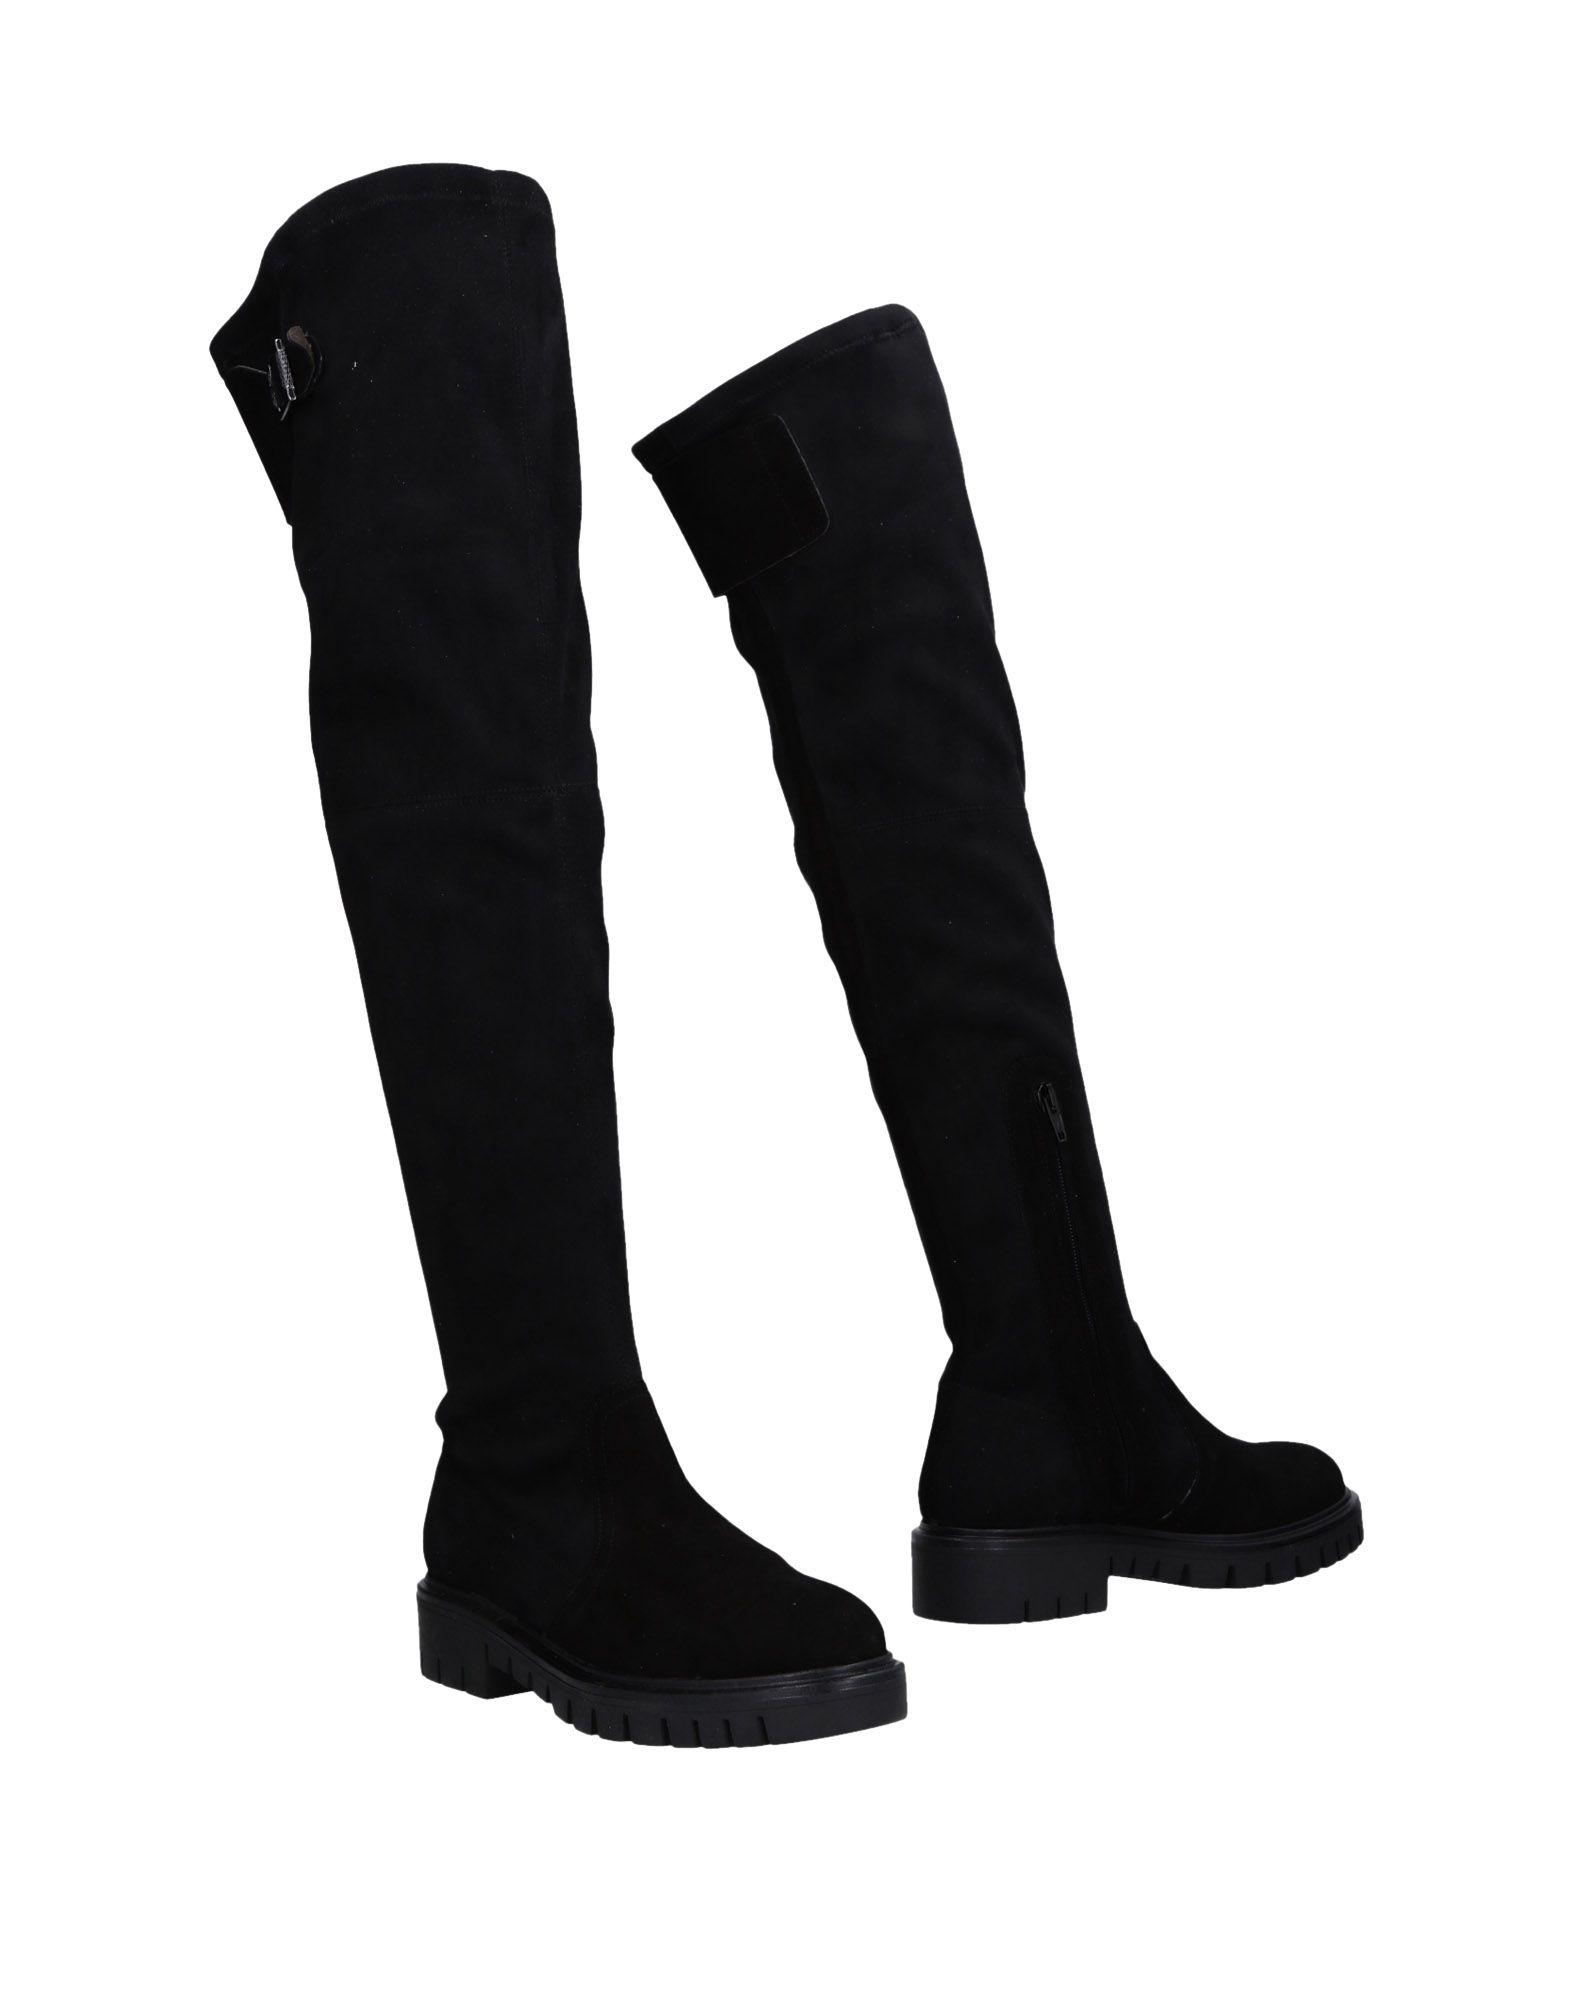 Paola Ferri Stiefel strapazierfähige Damen  11479232DTGut aussehende strapazierfähige Stiefel Schuhe f6d574